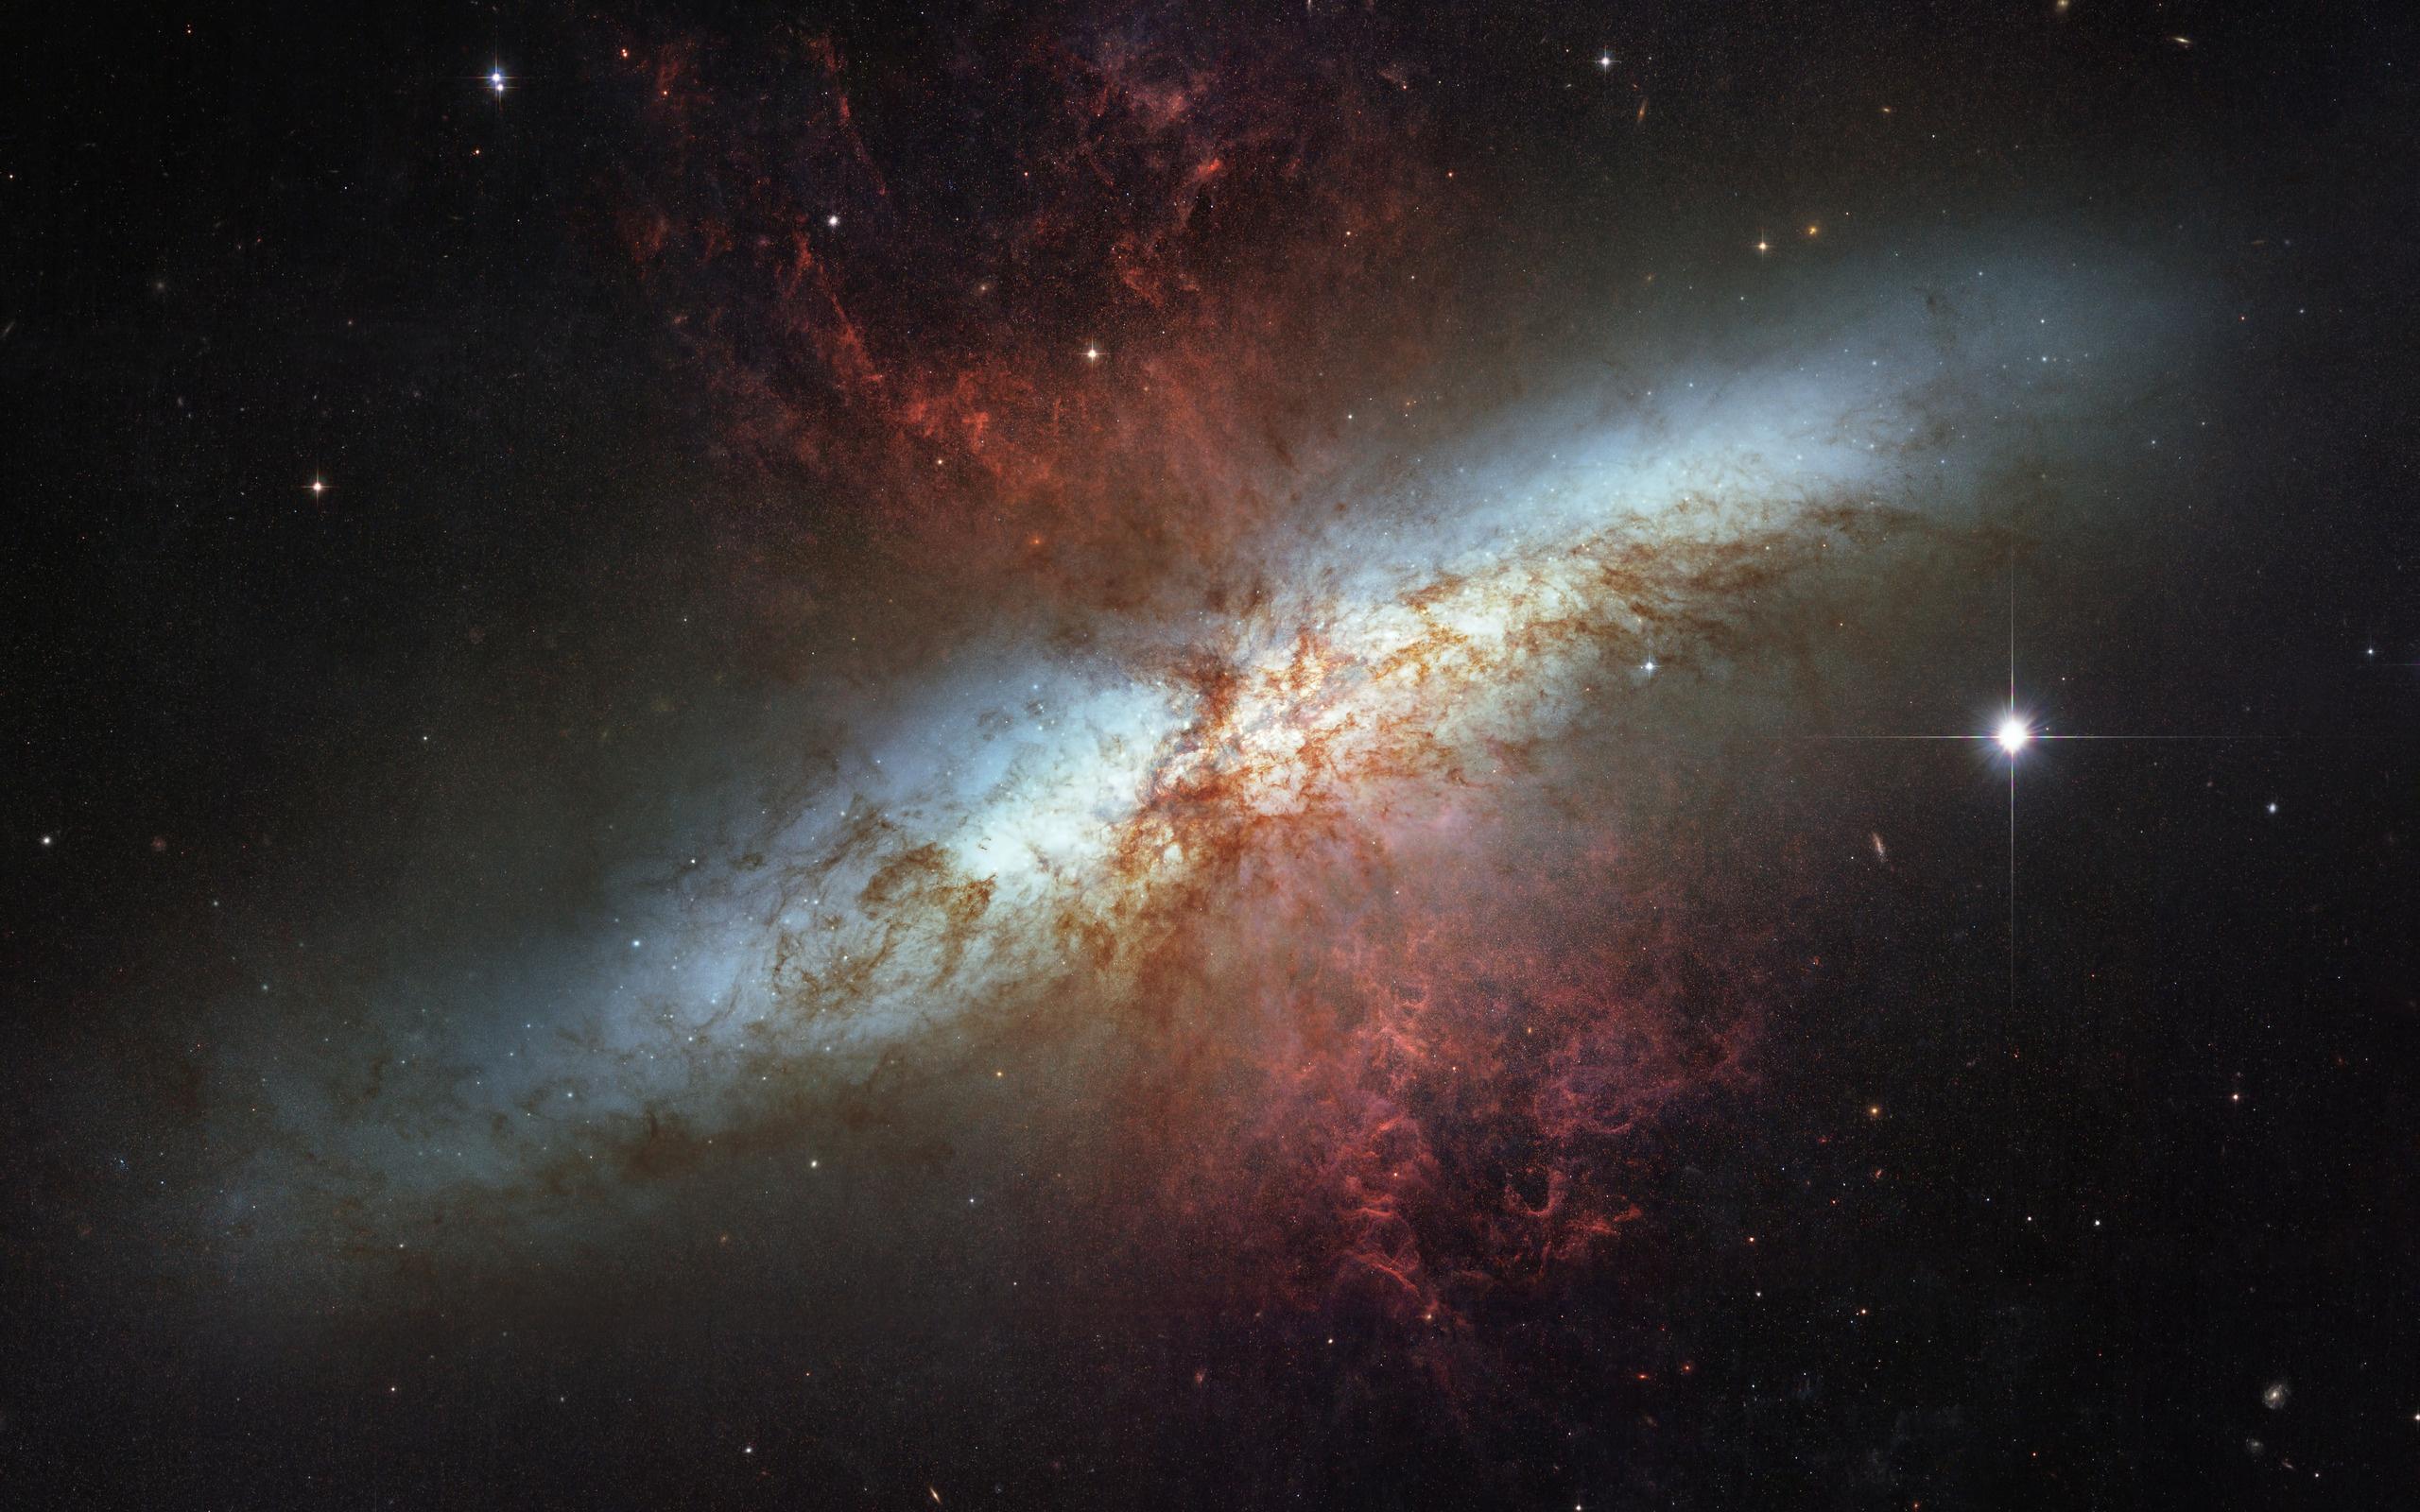 galaxy-wallpaper-background-HD_10